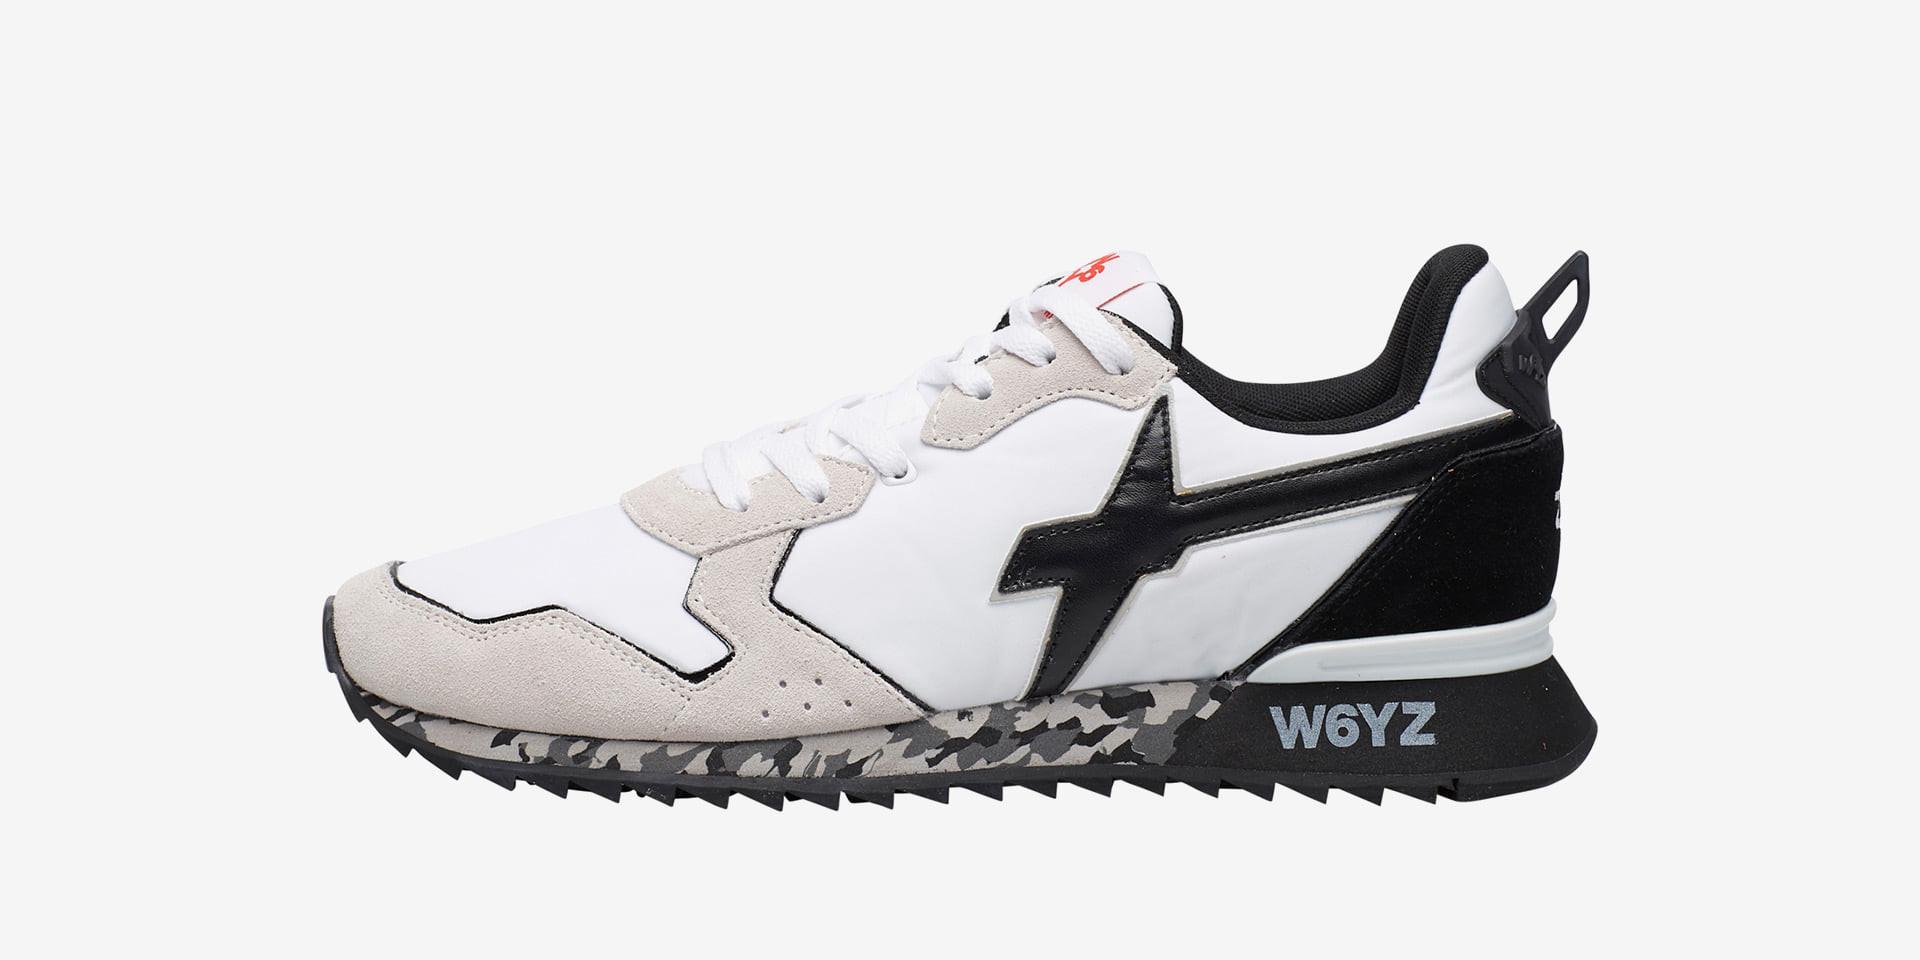 JET-M. - Sneaker in tessuto tecnico - Bianco/Nero